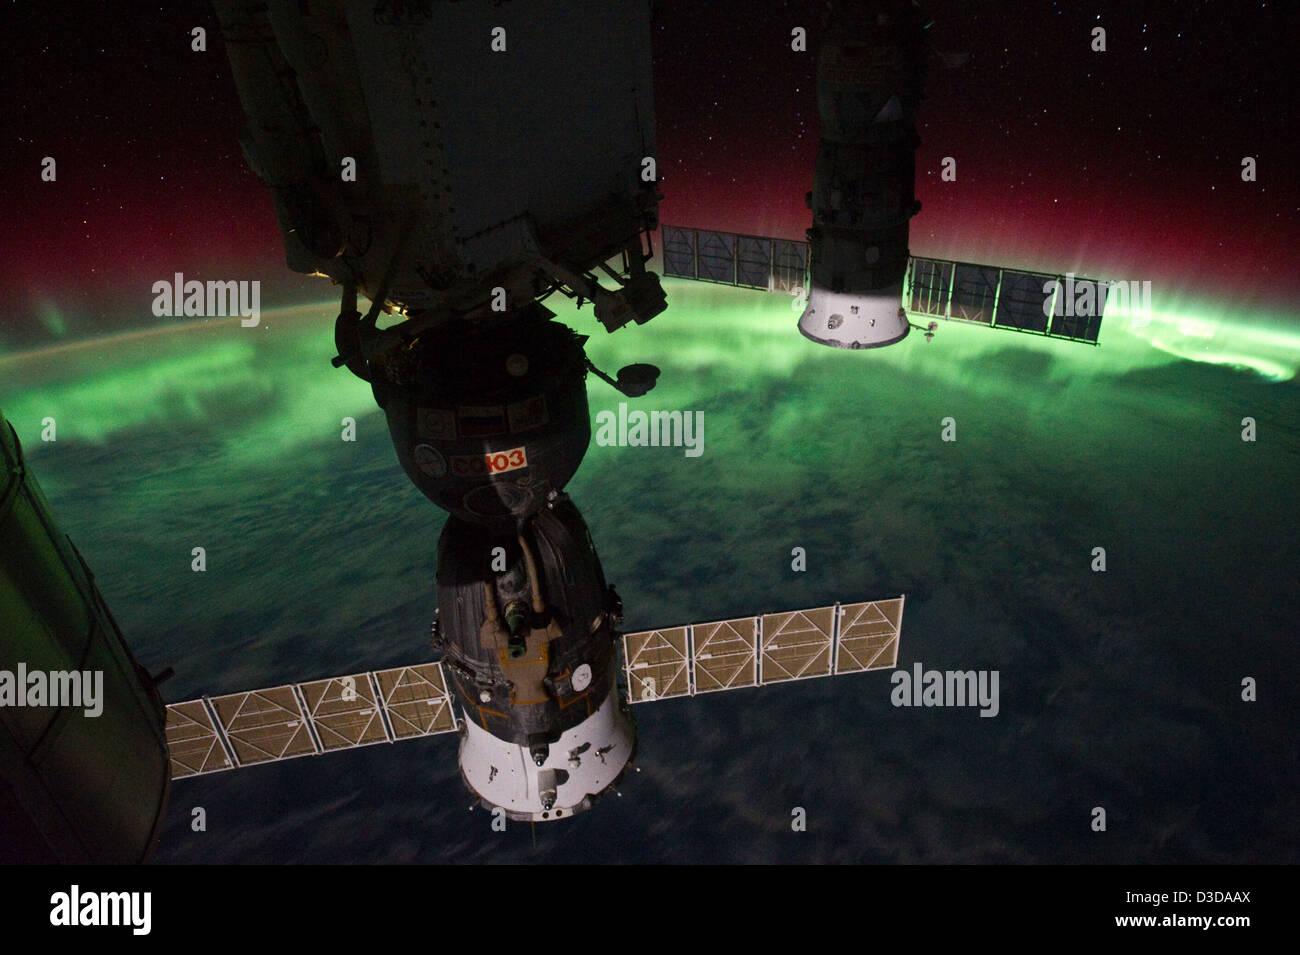 Aurora Australis Over New Zealand, Tasman Sea (NASA, International Space Station, 09/17/11) - Stock Image